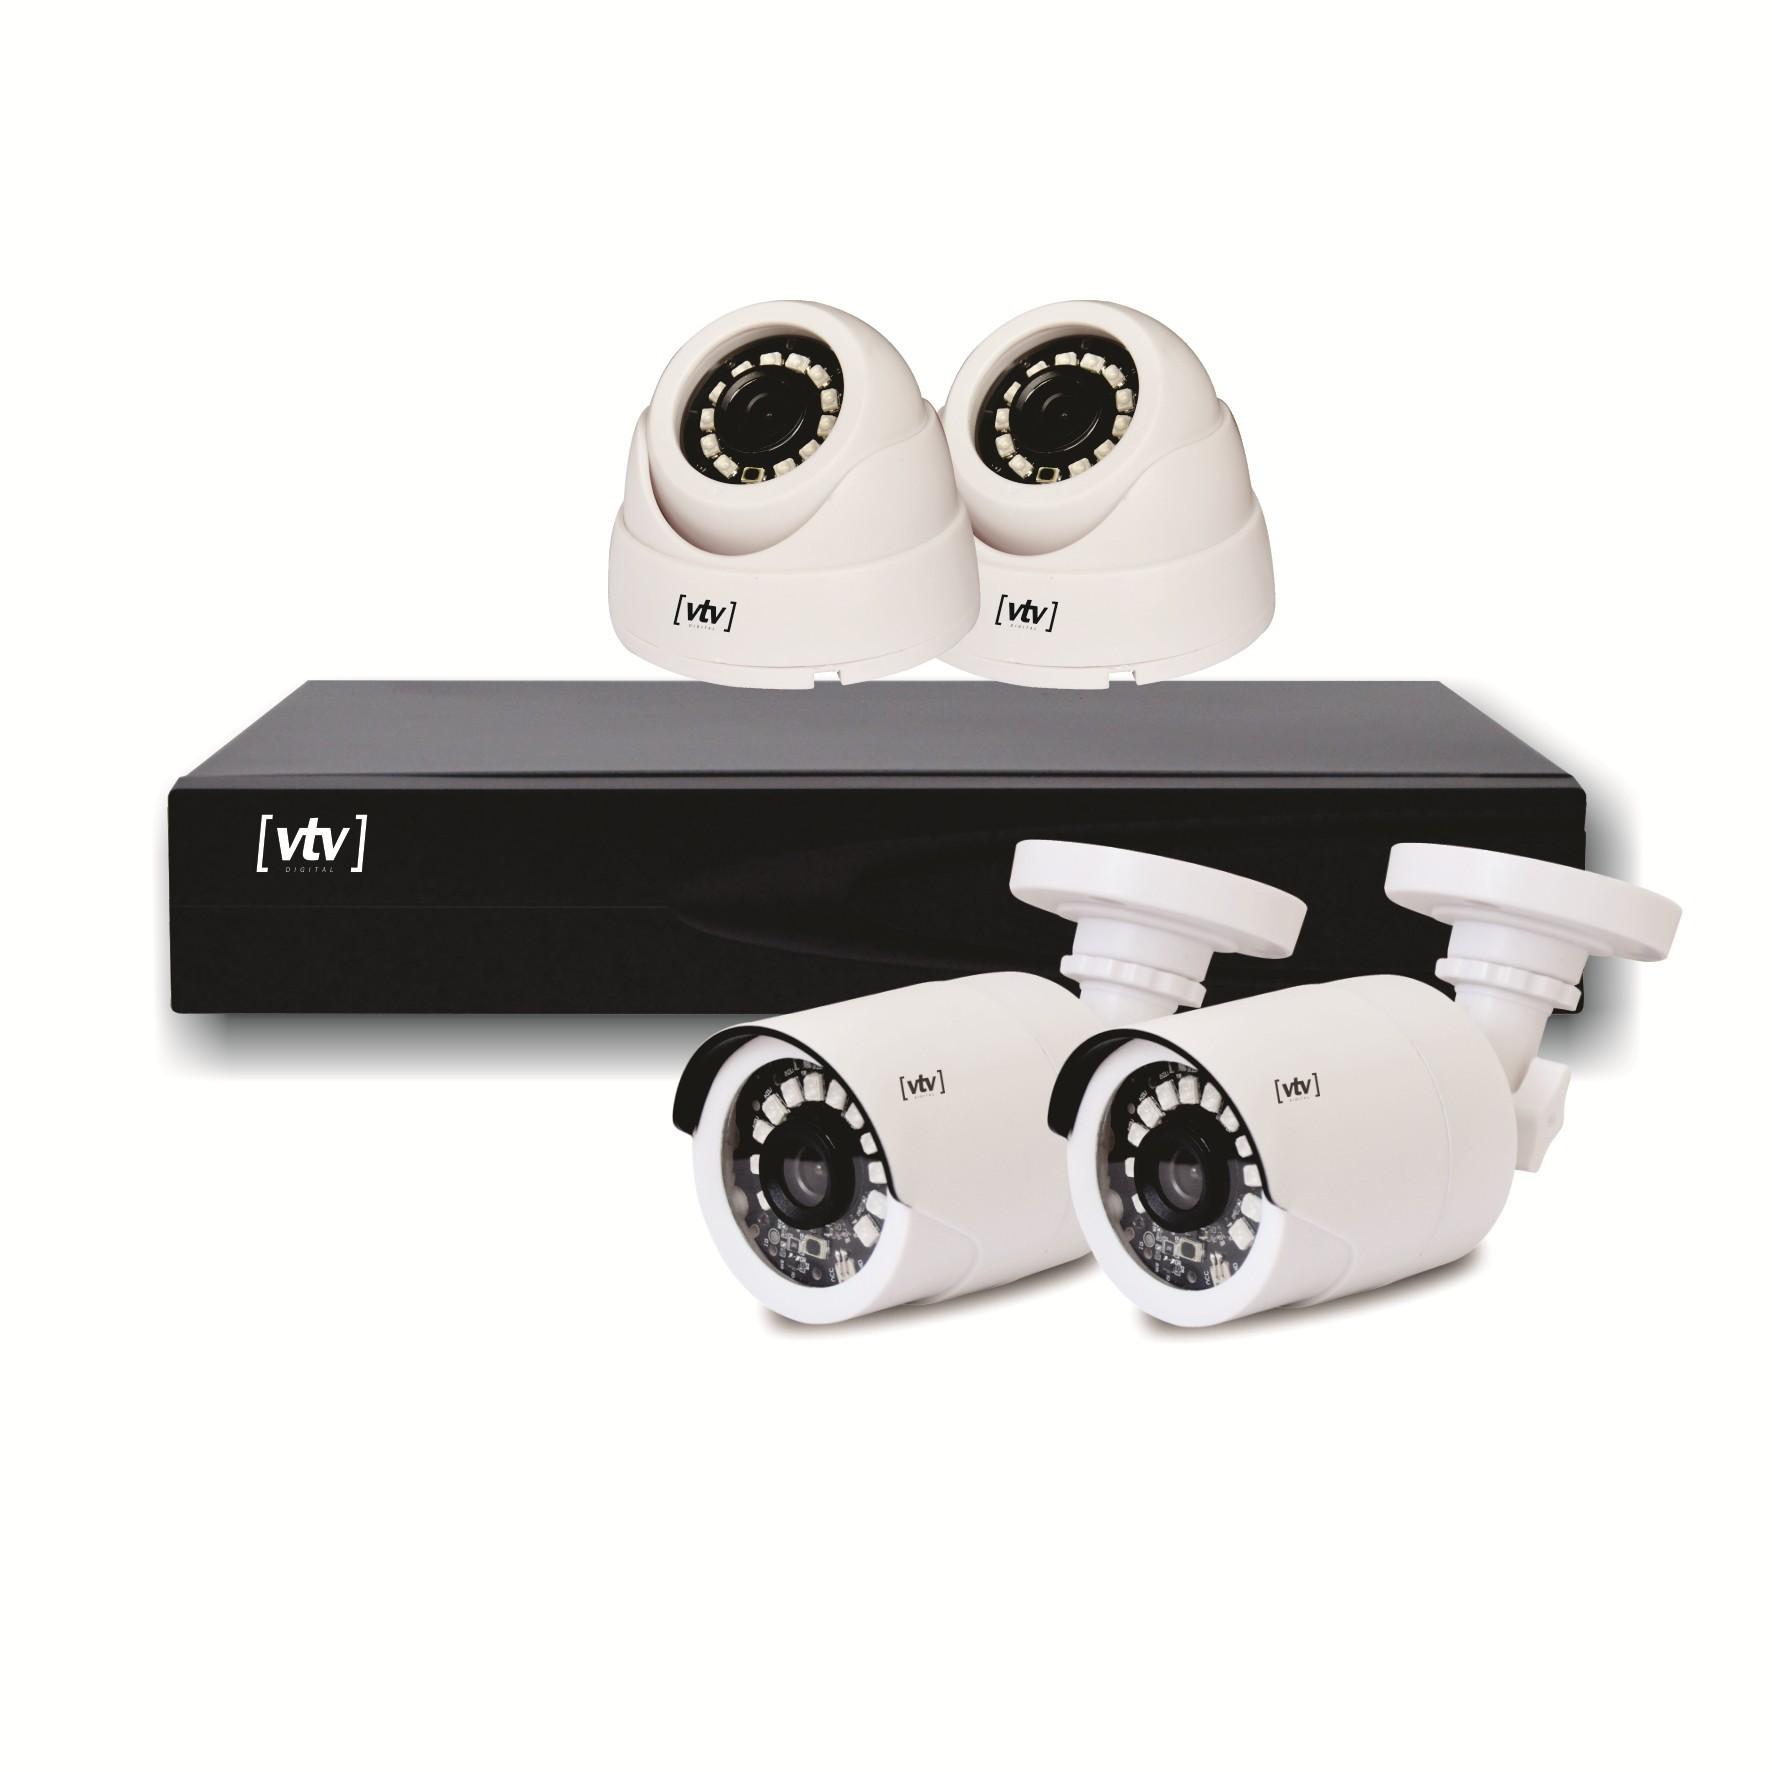 Kit 4 Cameras de Seguranca Full HD DVR Canais - VTV